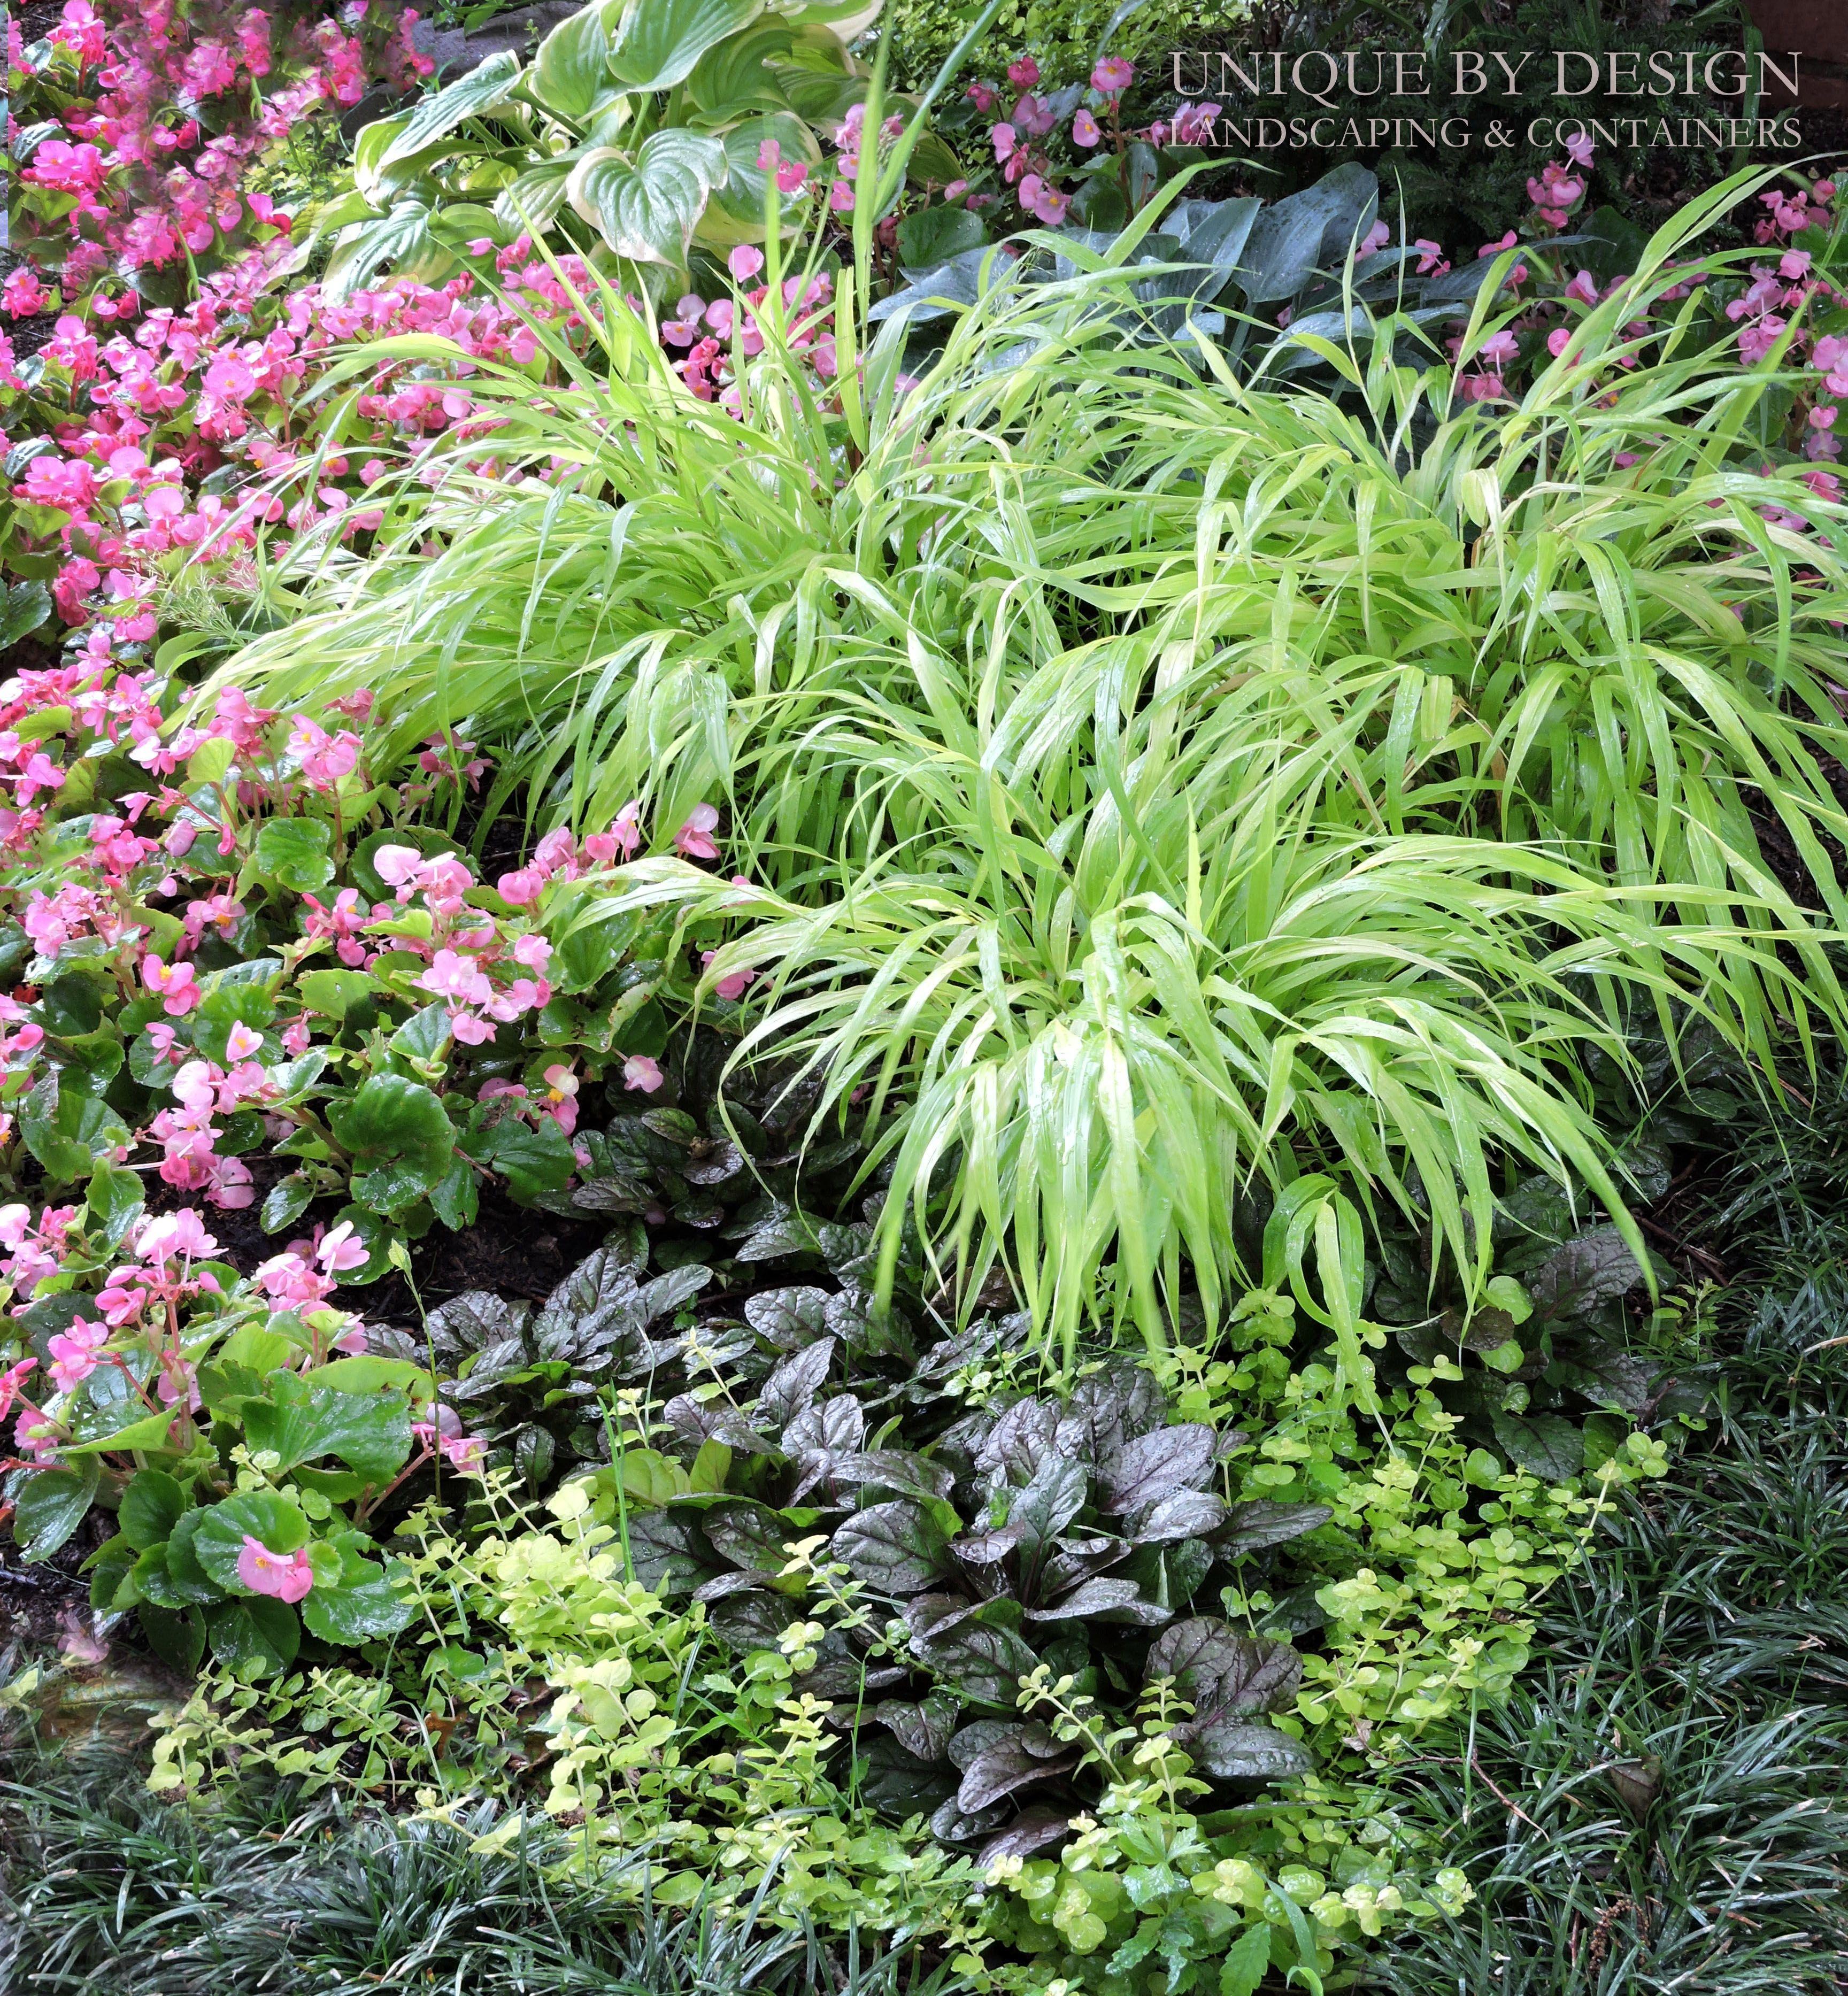 Alberi Ornamentali Da Giardino japanese forest grass l hakonechloa macra 'all gold'